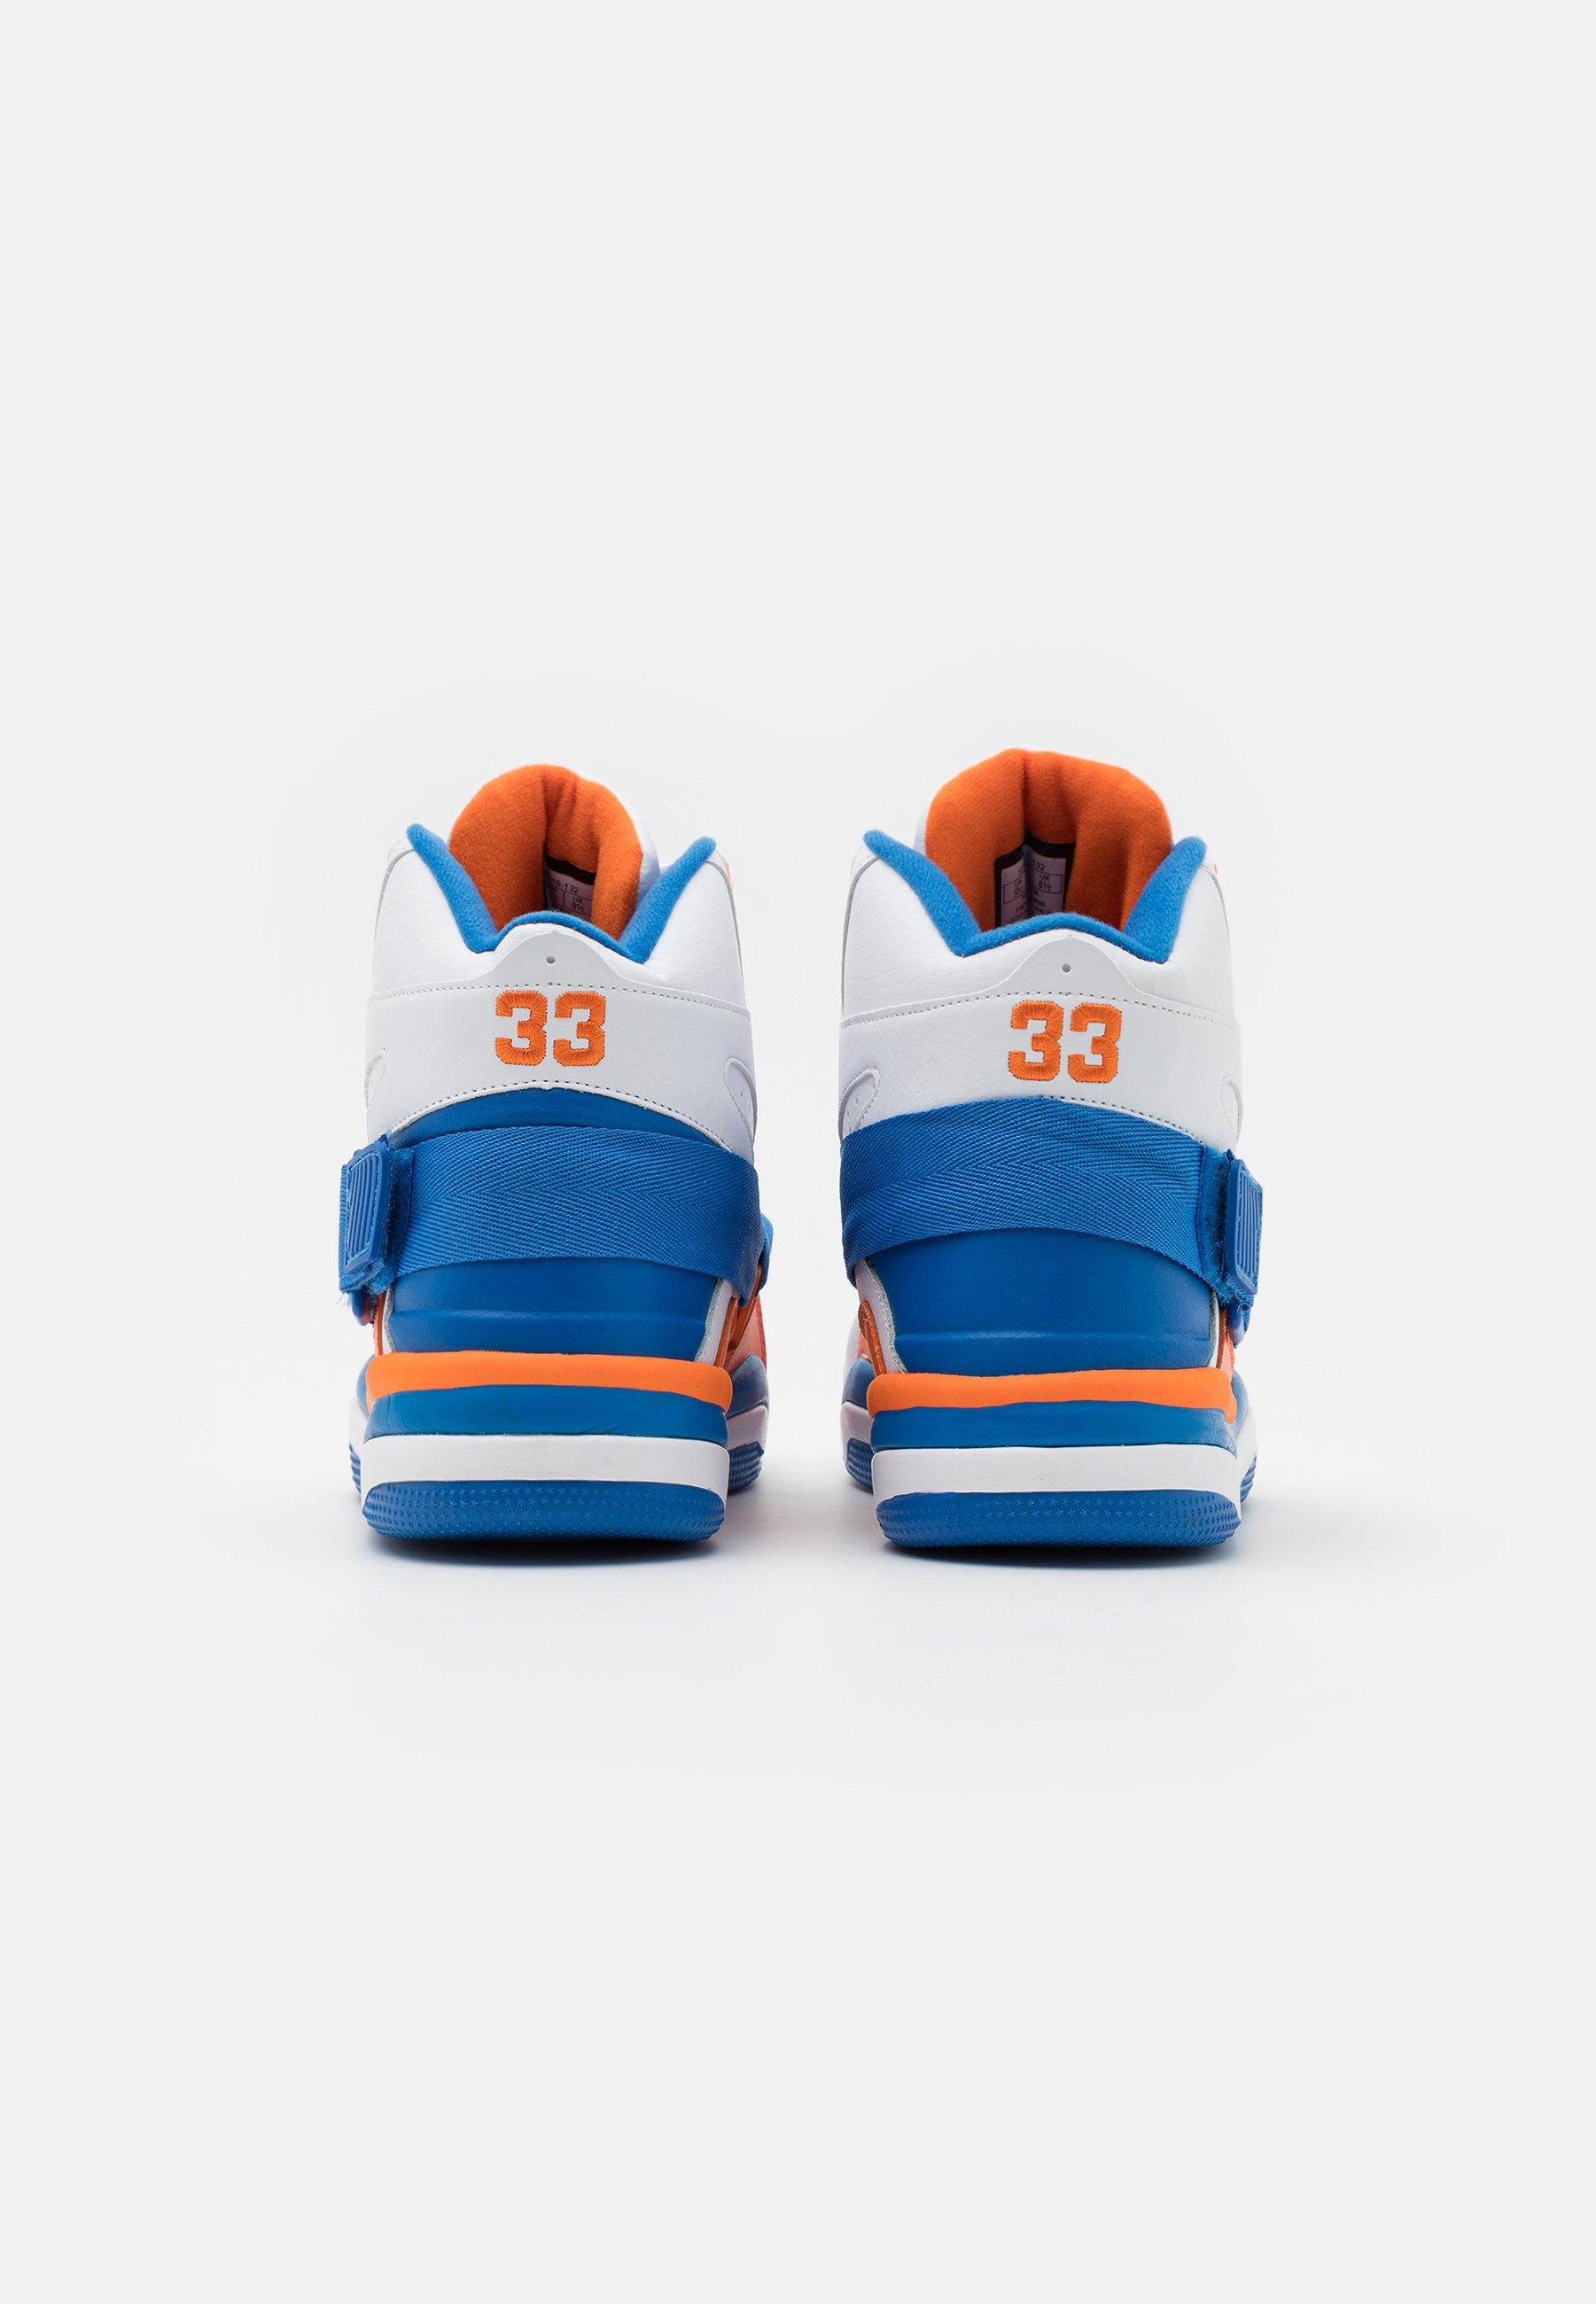 Ewing CONCEPT - Sneaker high - white/royal orange/weiß - Herrenschuhe UG5M4